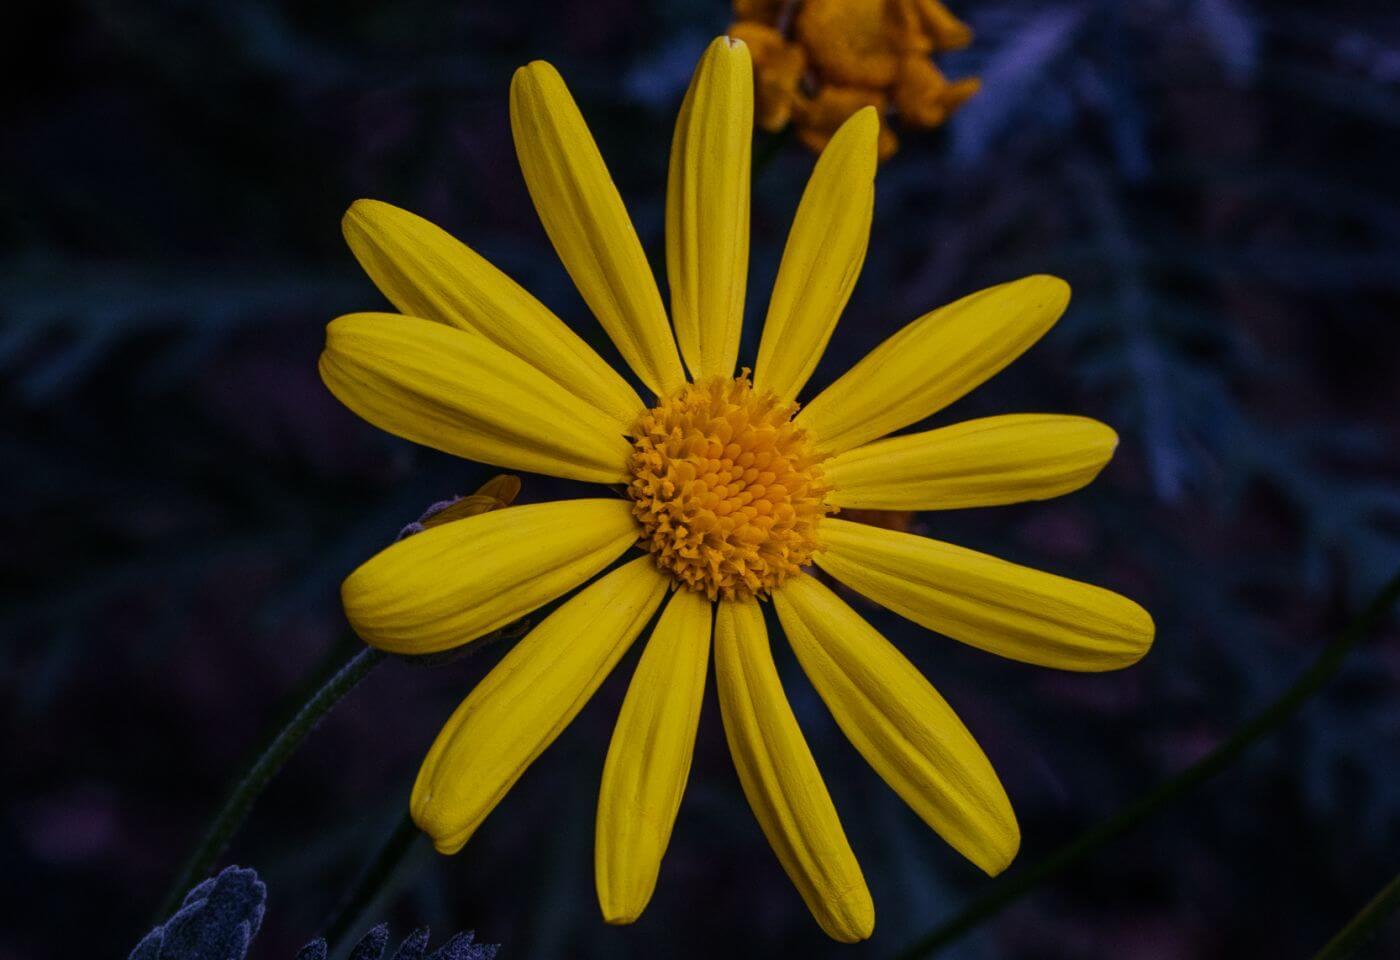 Close up of a sunflower